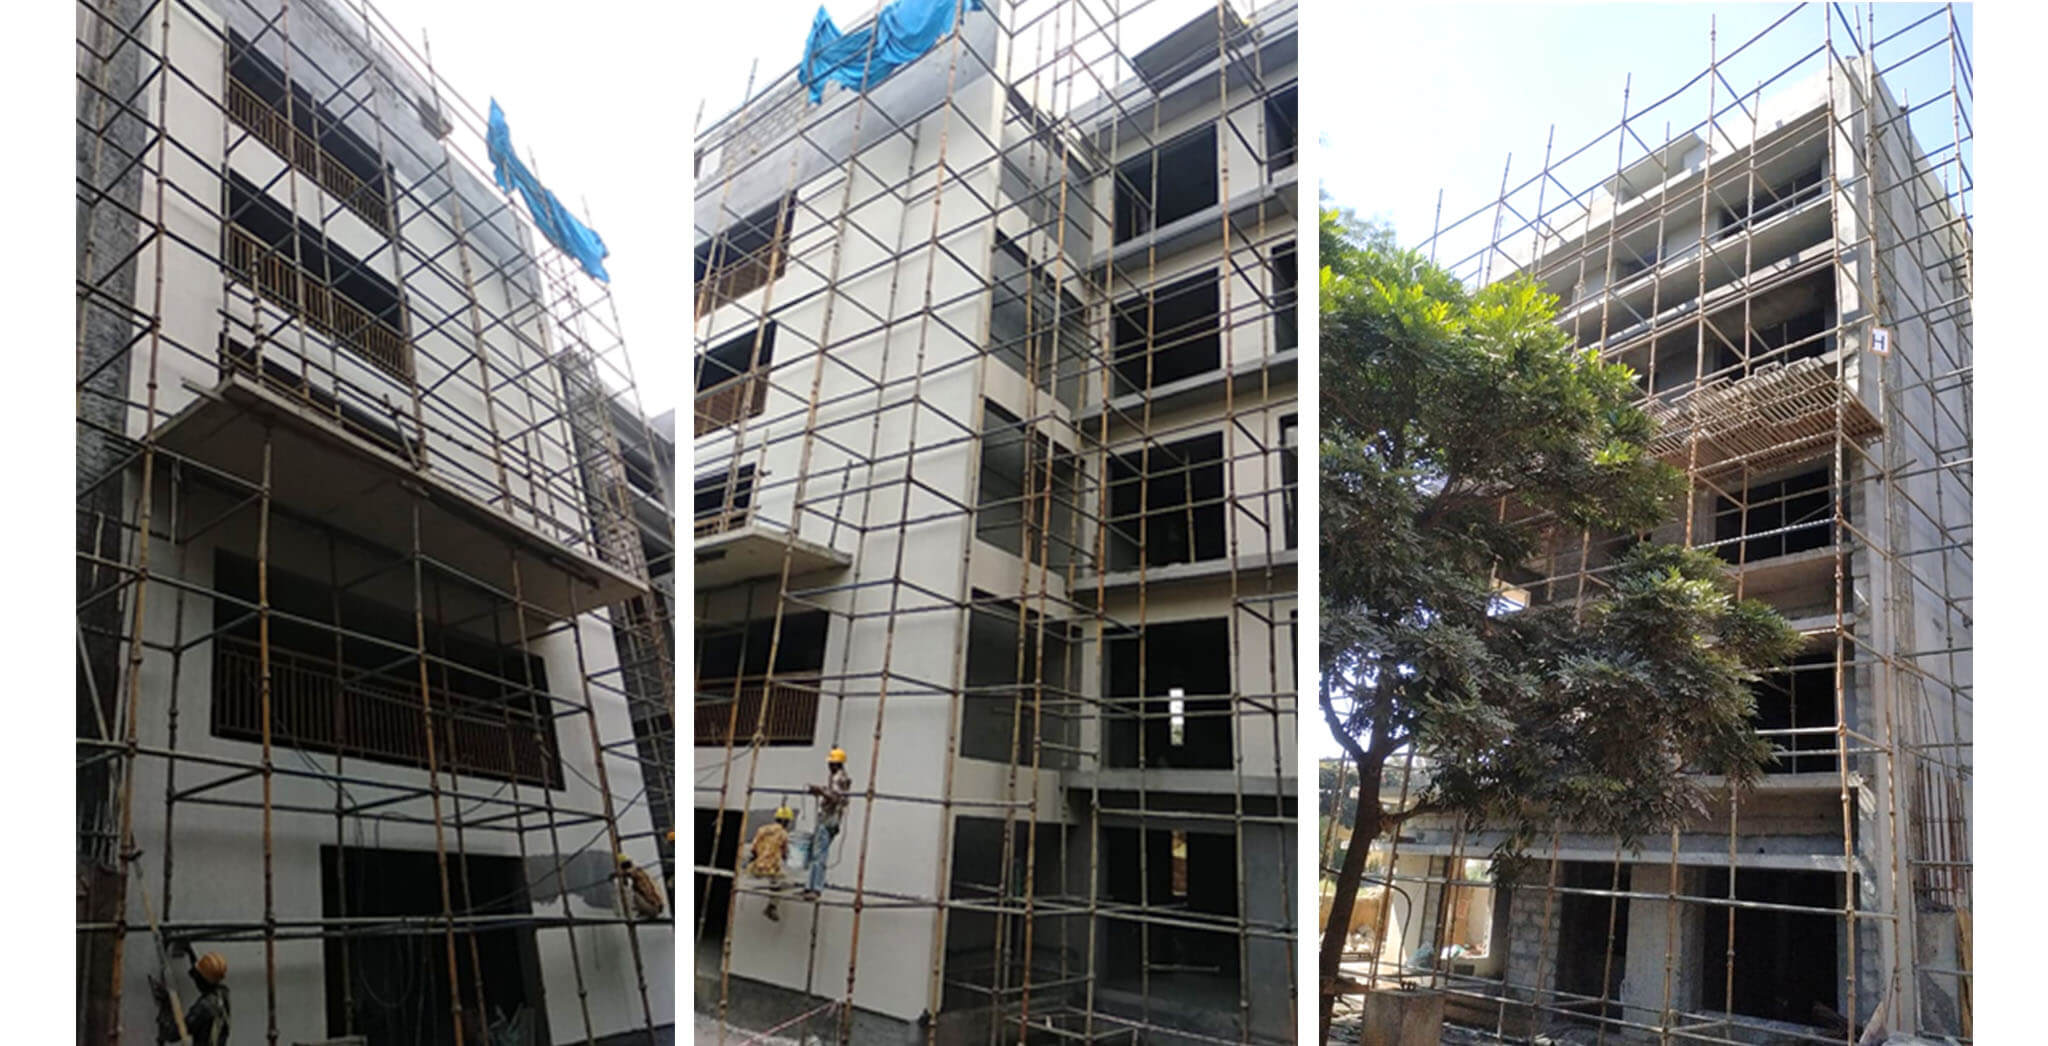 Dec 2020 - H Block: East Elevation external plastering and North elevation external texture work-in-progress.